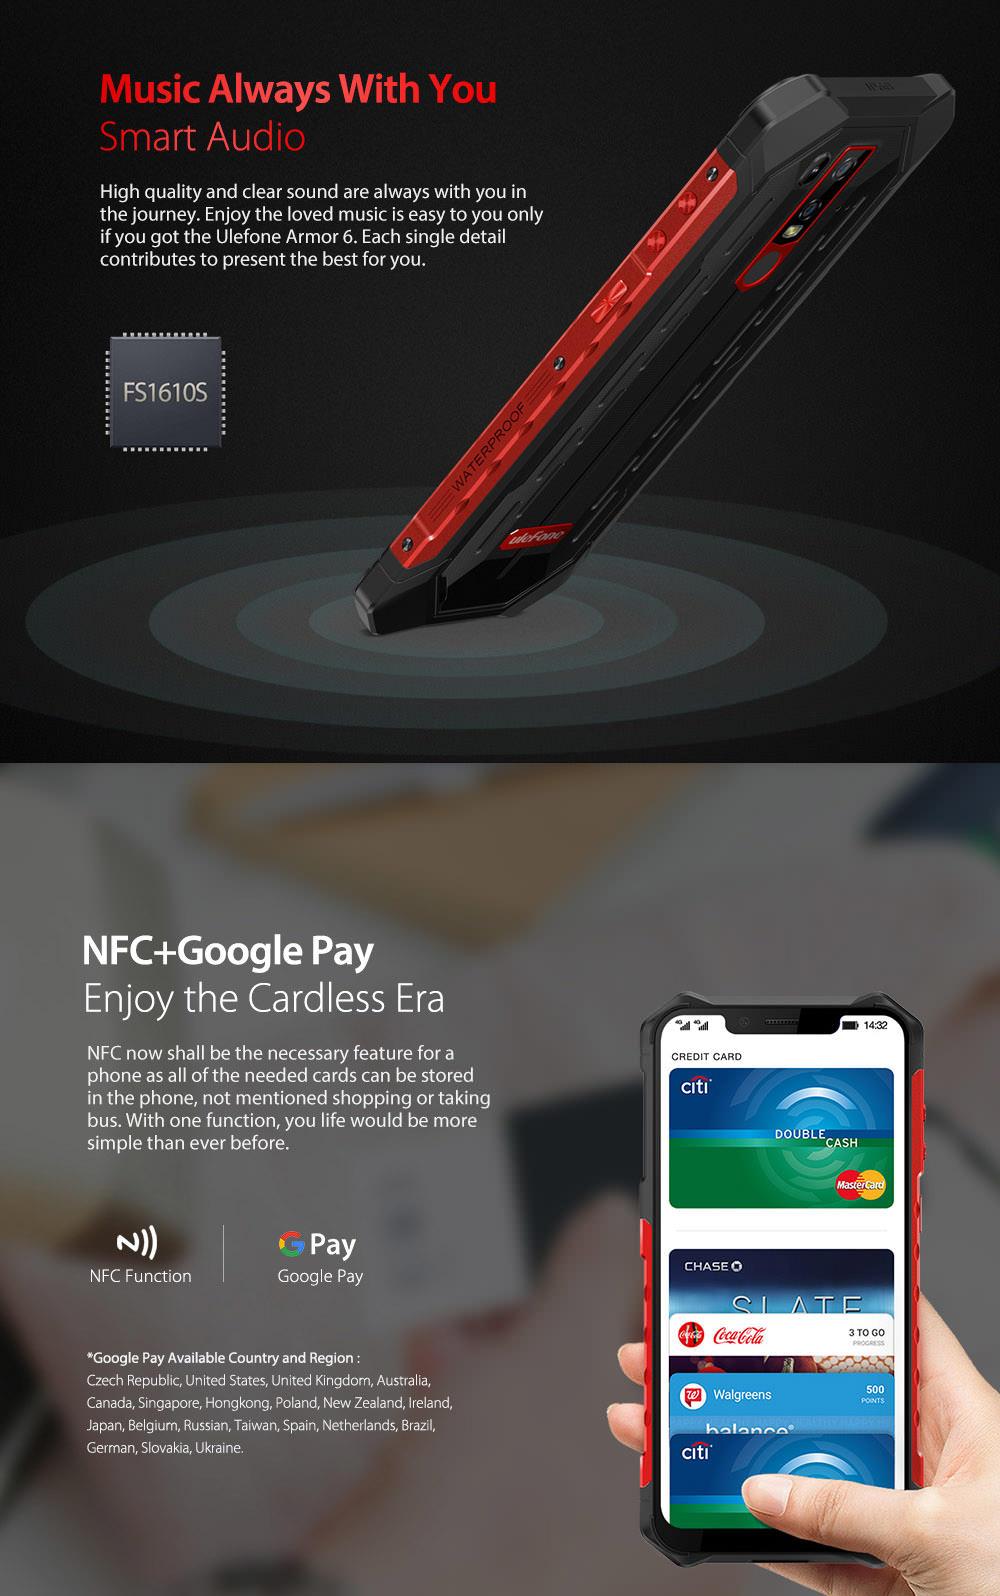 ulefone armor 6 4g smartphone online